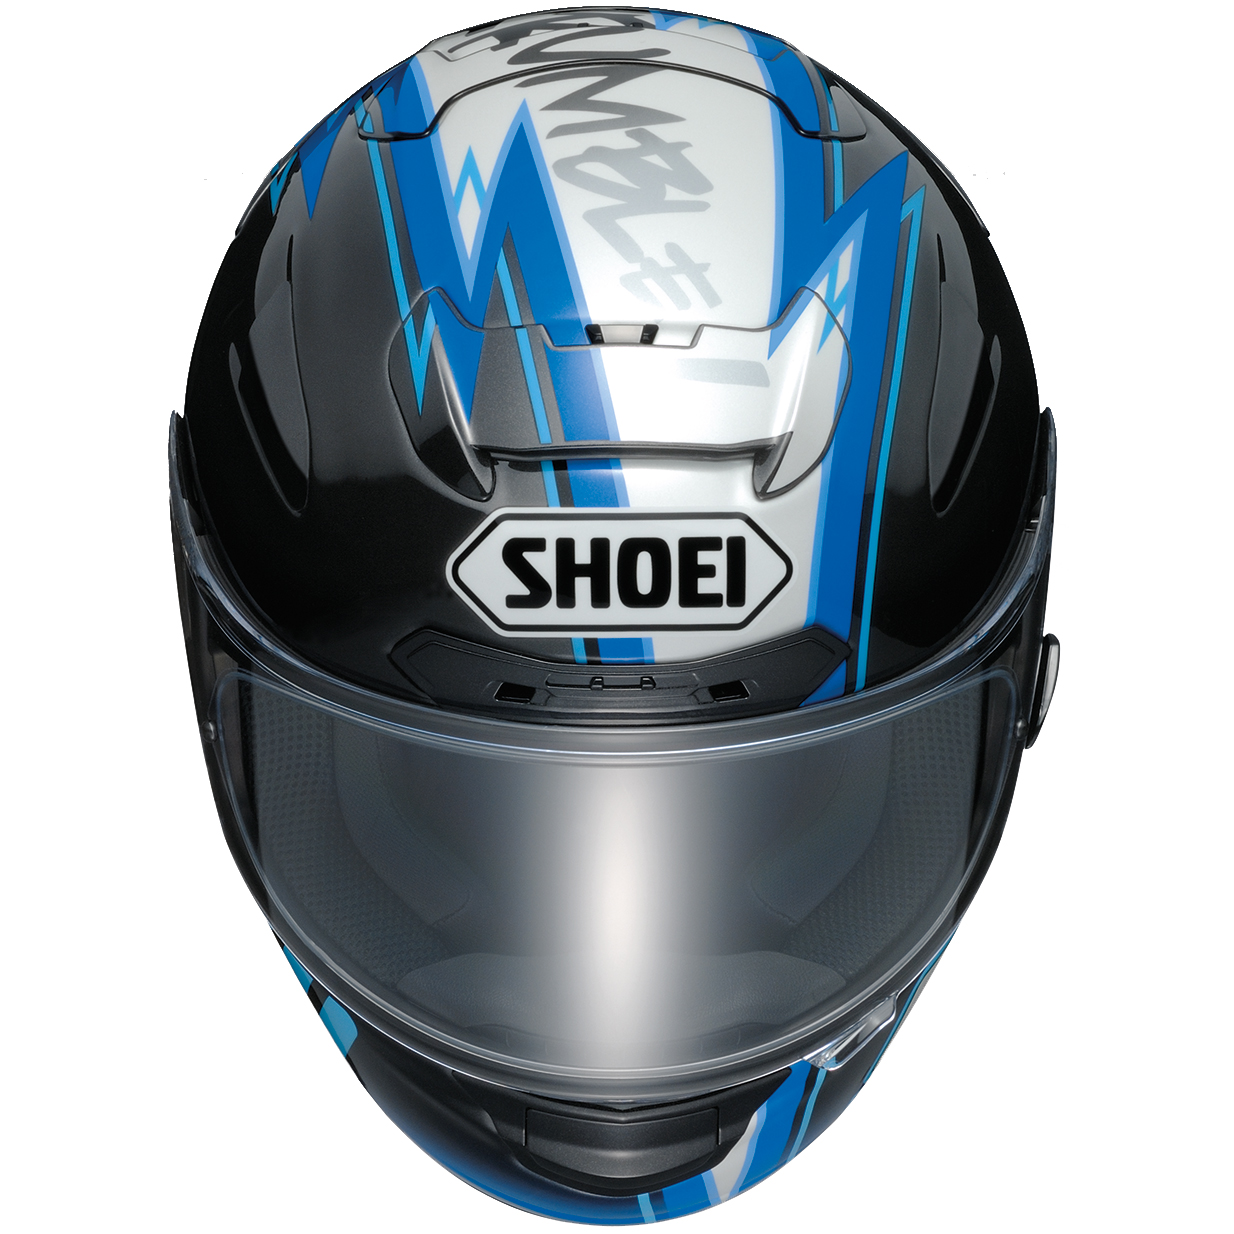 shoei x spirit 2 marquez montmelo black blue white motorcycle helmet full face ebay. Black Bedroom Furniture Sets. Home Design Ideas